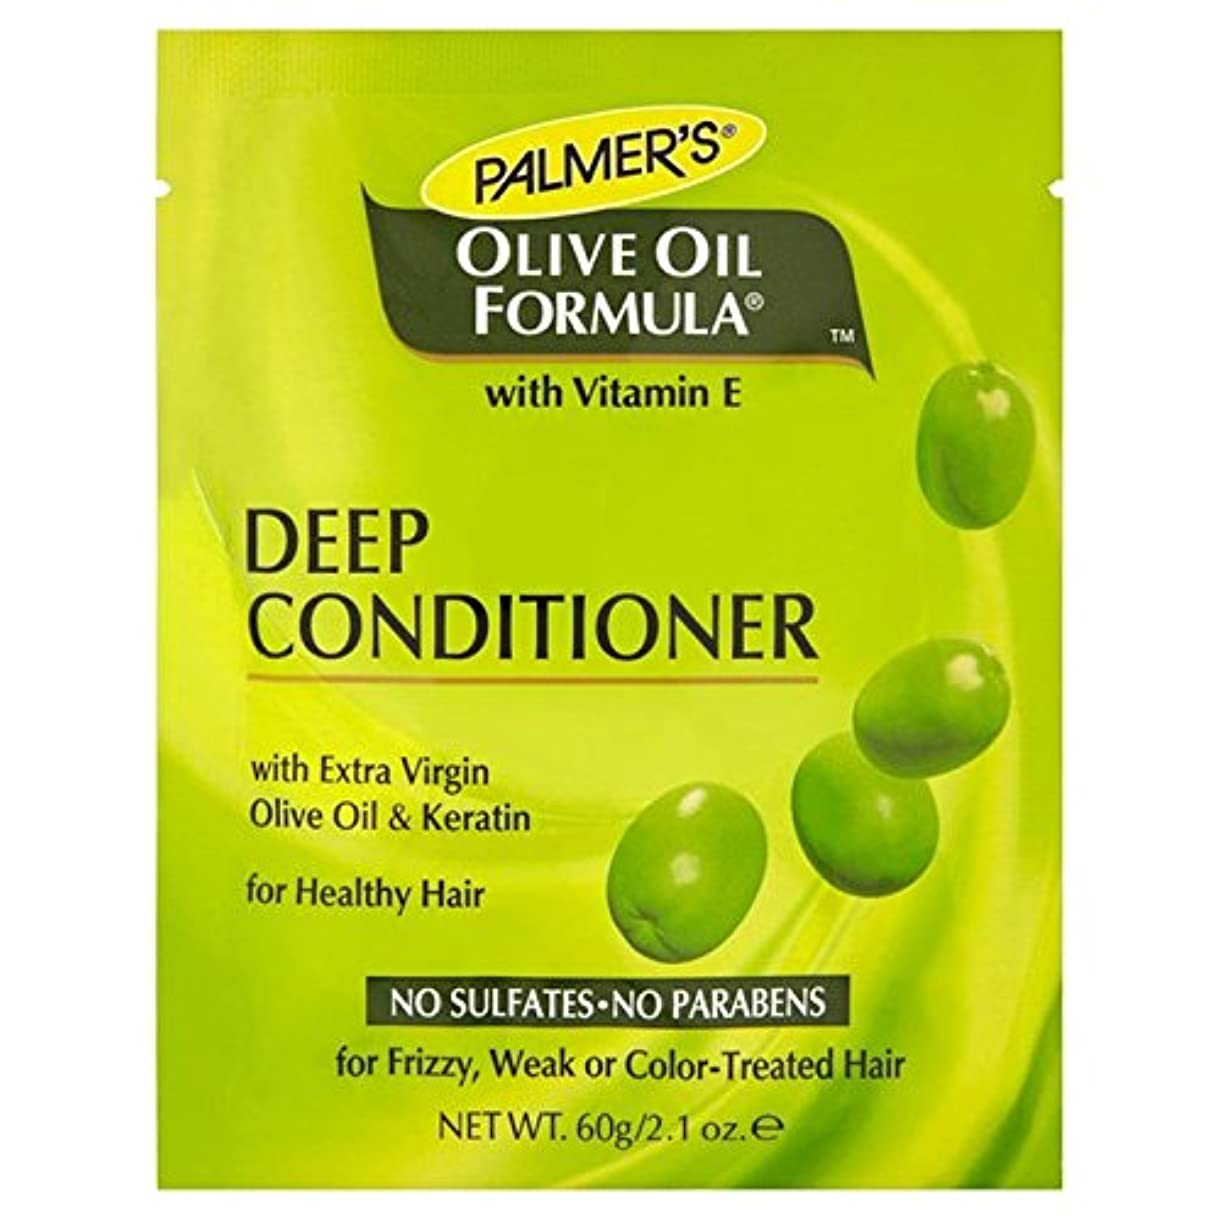 Palmer's Olive Oil Formula Deep Conditioner Protein Pack 60g - パーマーのオリーブオイル式深いコンディショナータンパク質パック60グラム [並行輸入品]